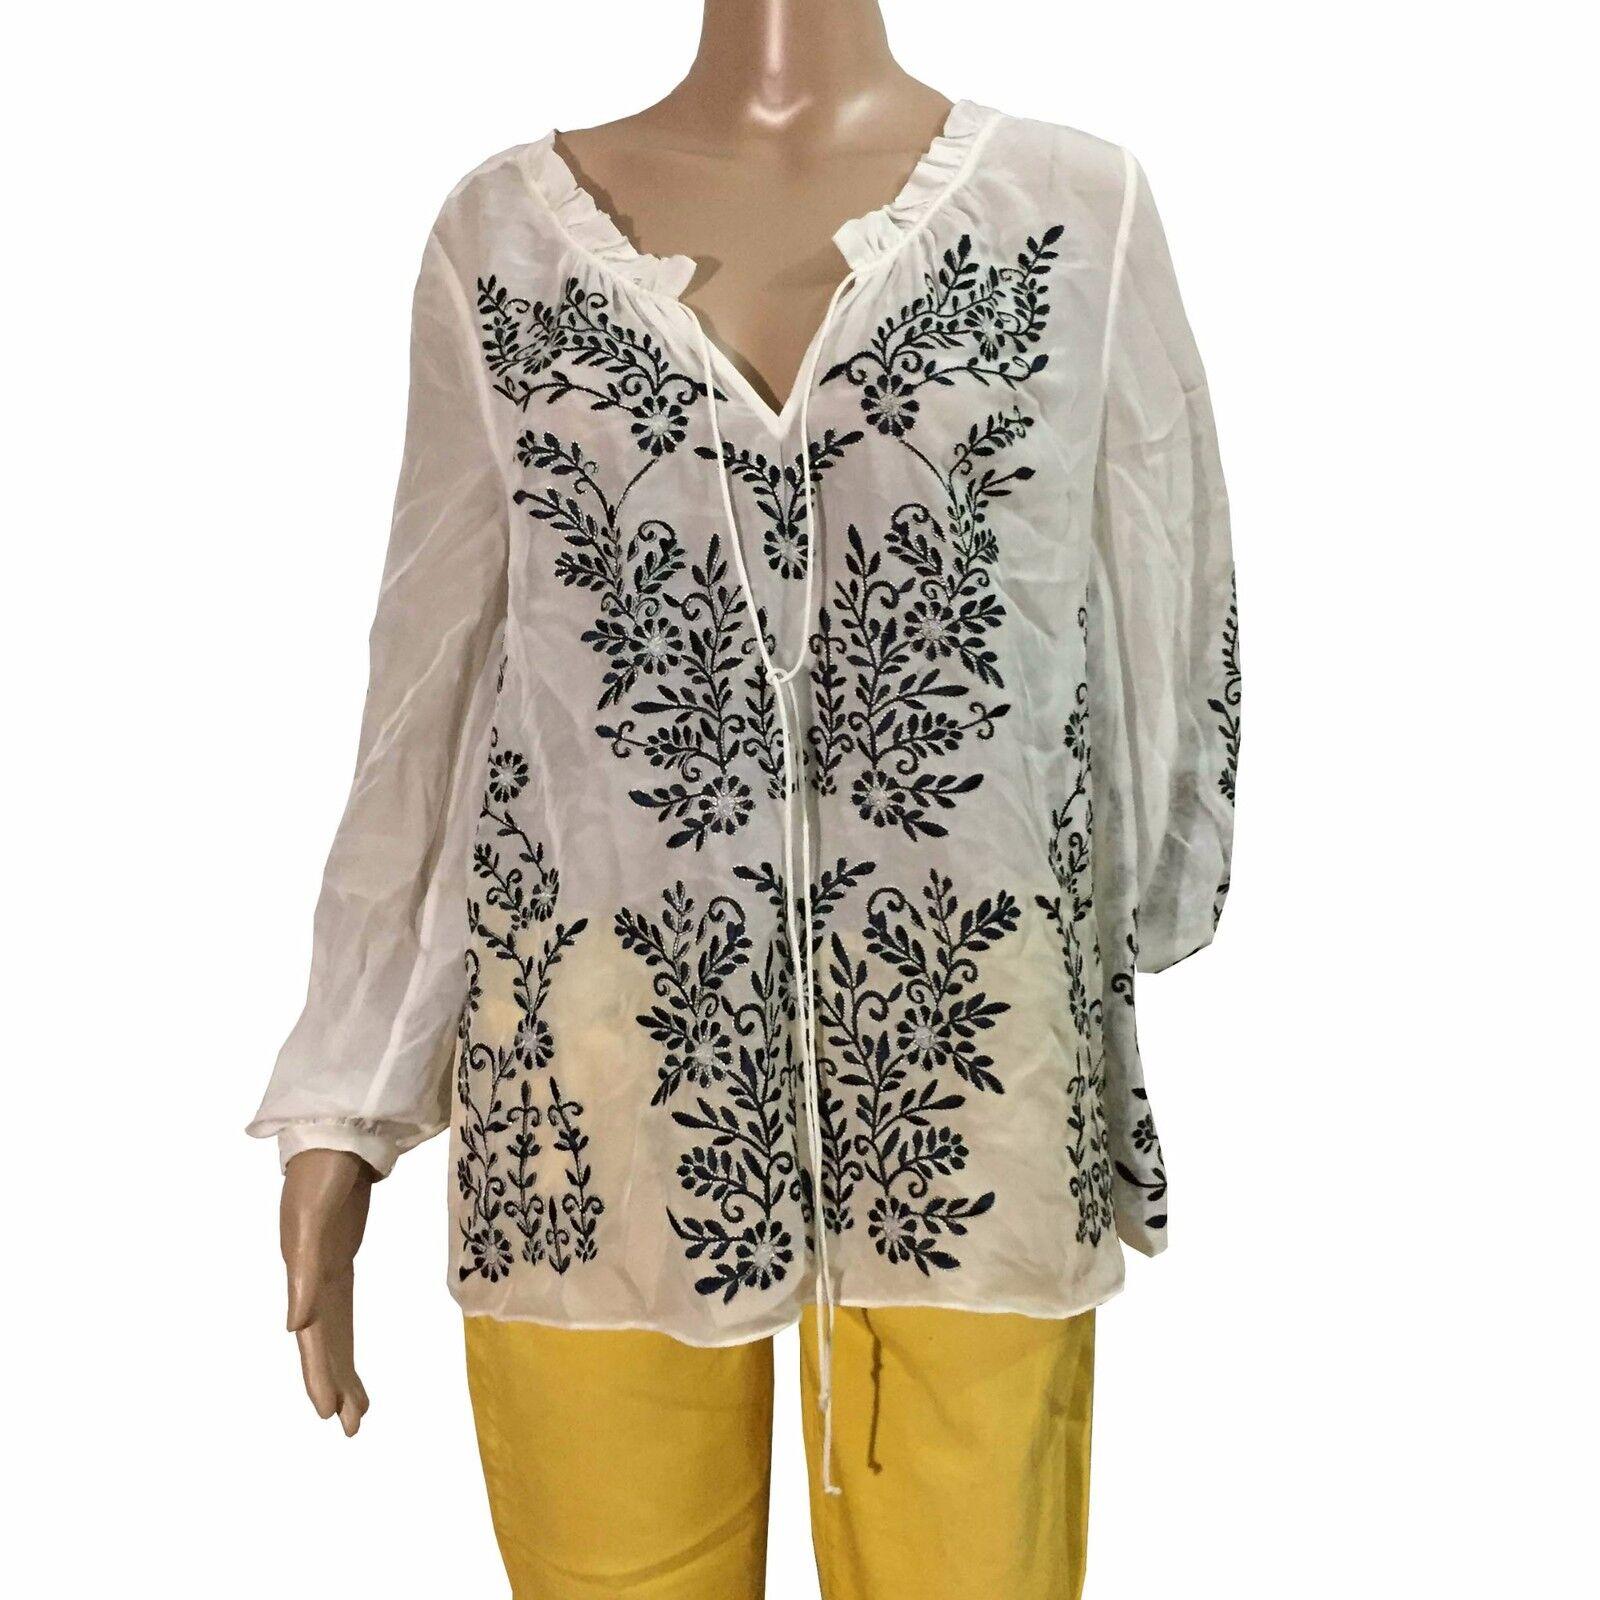 Alice & Olivia Embroiderot Long Sleeve Weiß Blouse V-Neck Tie Top Silk Größe S P